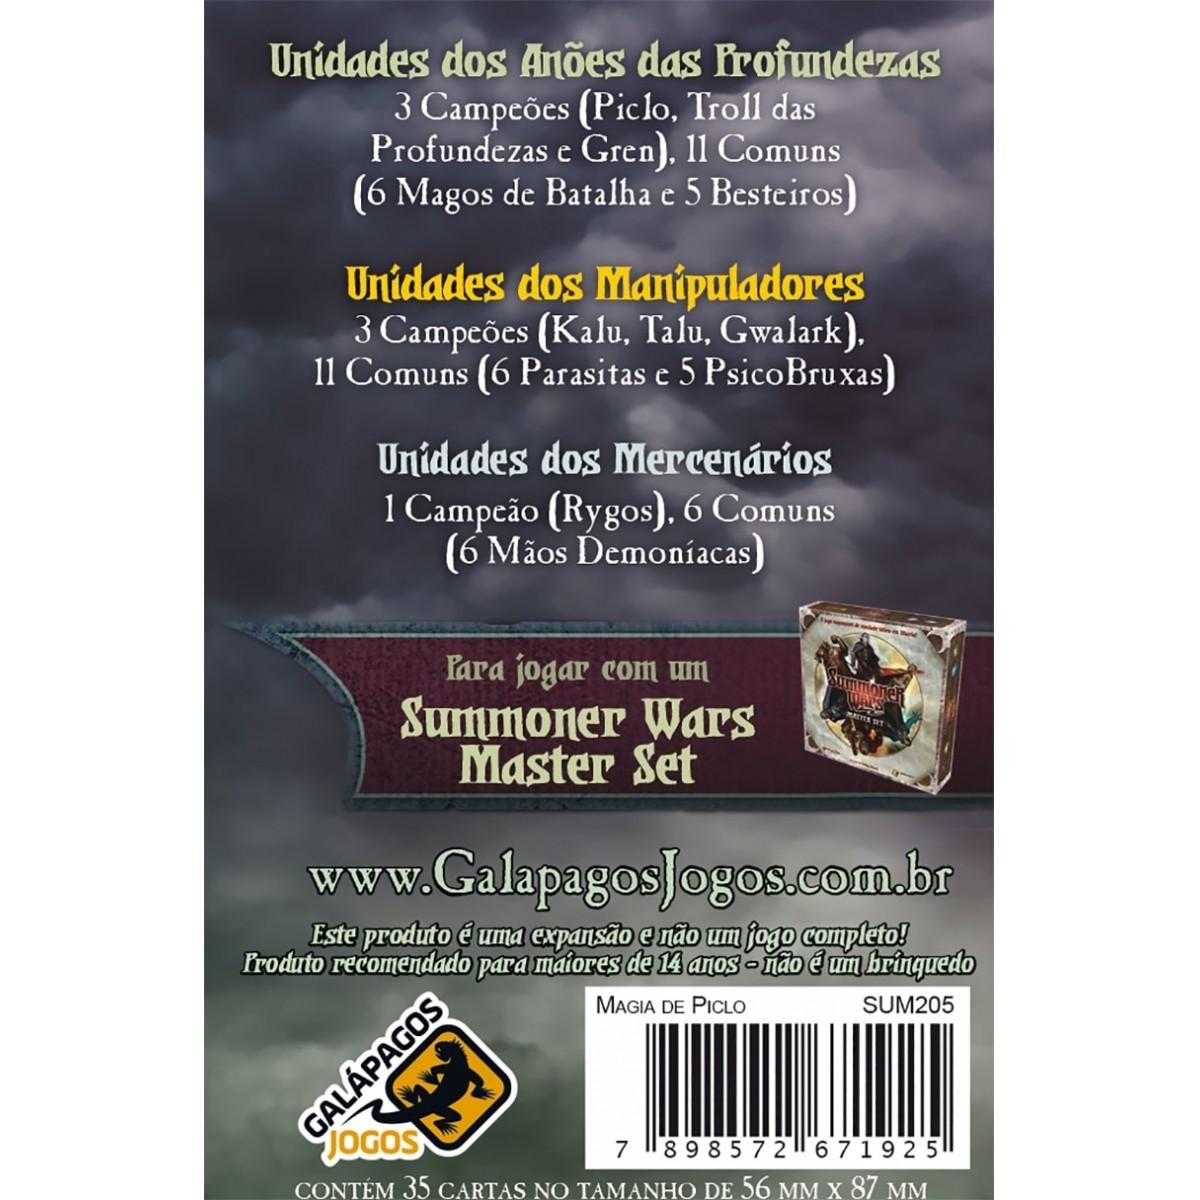 Summoner Wars Pacote de Reforços Magia de Piclo Galapagos SUM205  - Place Games